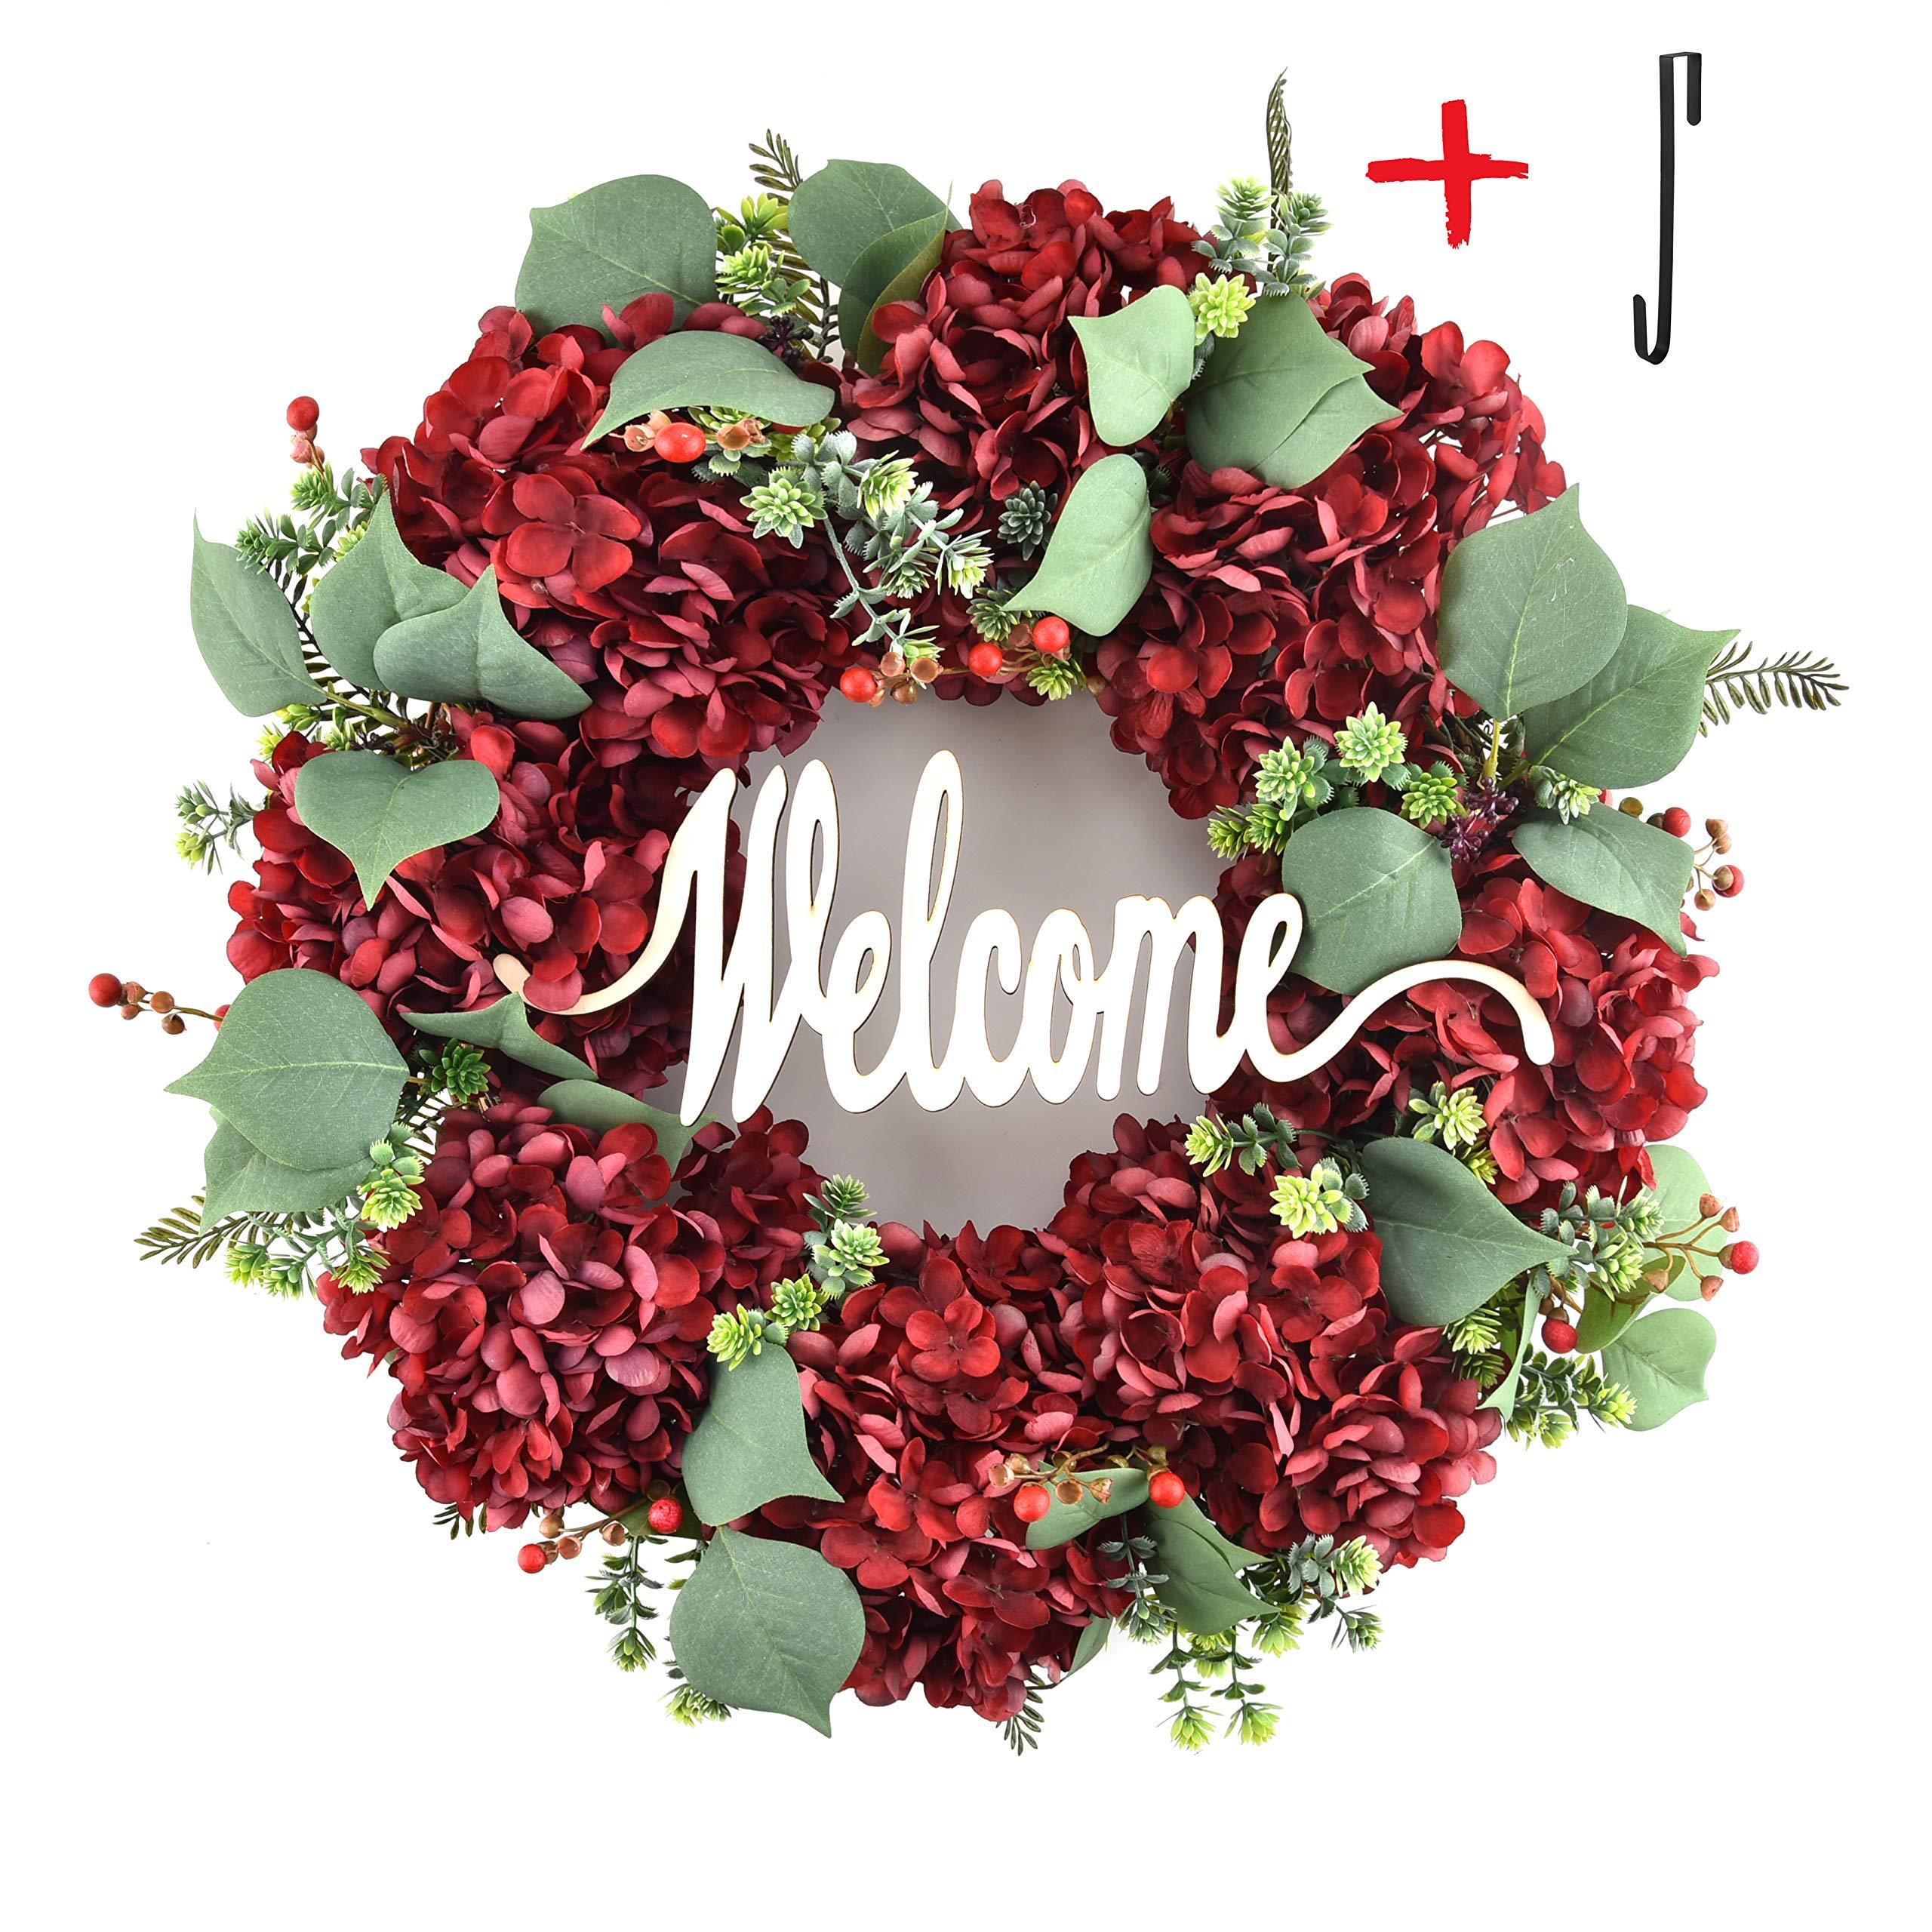 Welcome Wreaths for Front Door Handmade Hydrangea Wreath,Letter Wreaths for Front Door,Fall Wreath,Farmhouse Door Wreaths,Grapevine Wreath,Spring Summer Wreaths for Front Door Winter (19 inches) by DHKWreaths